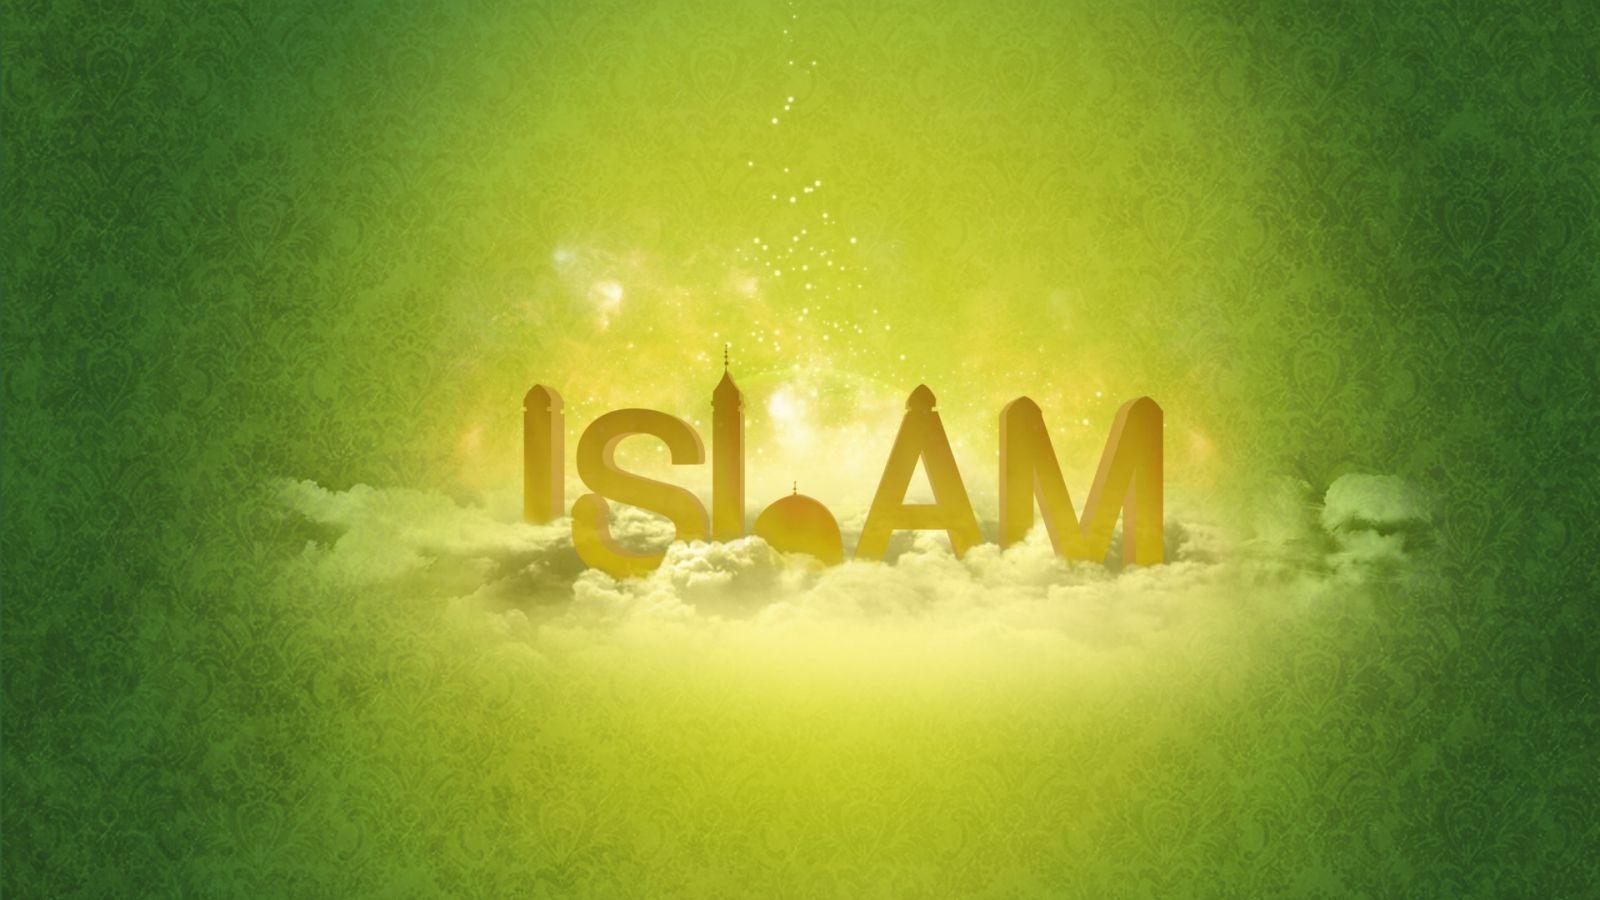 islamic wallpaper free download